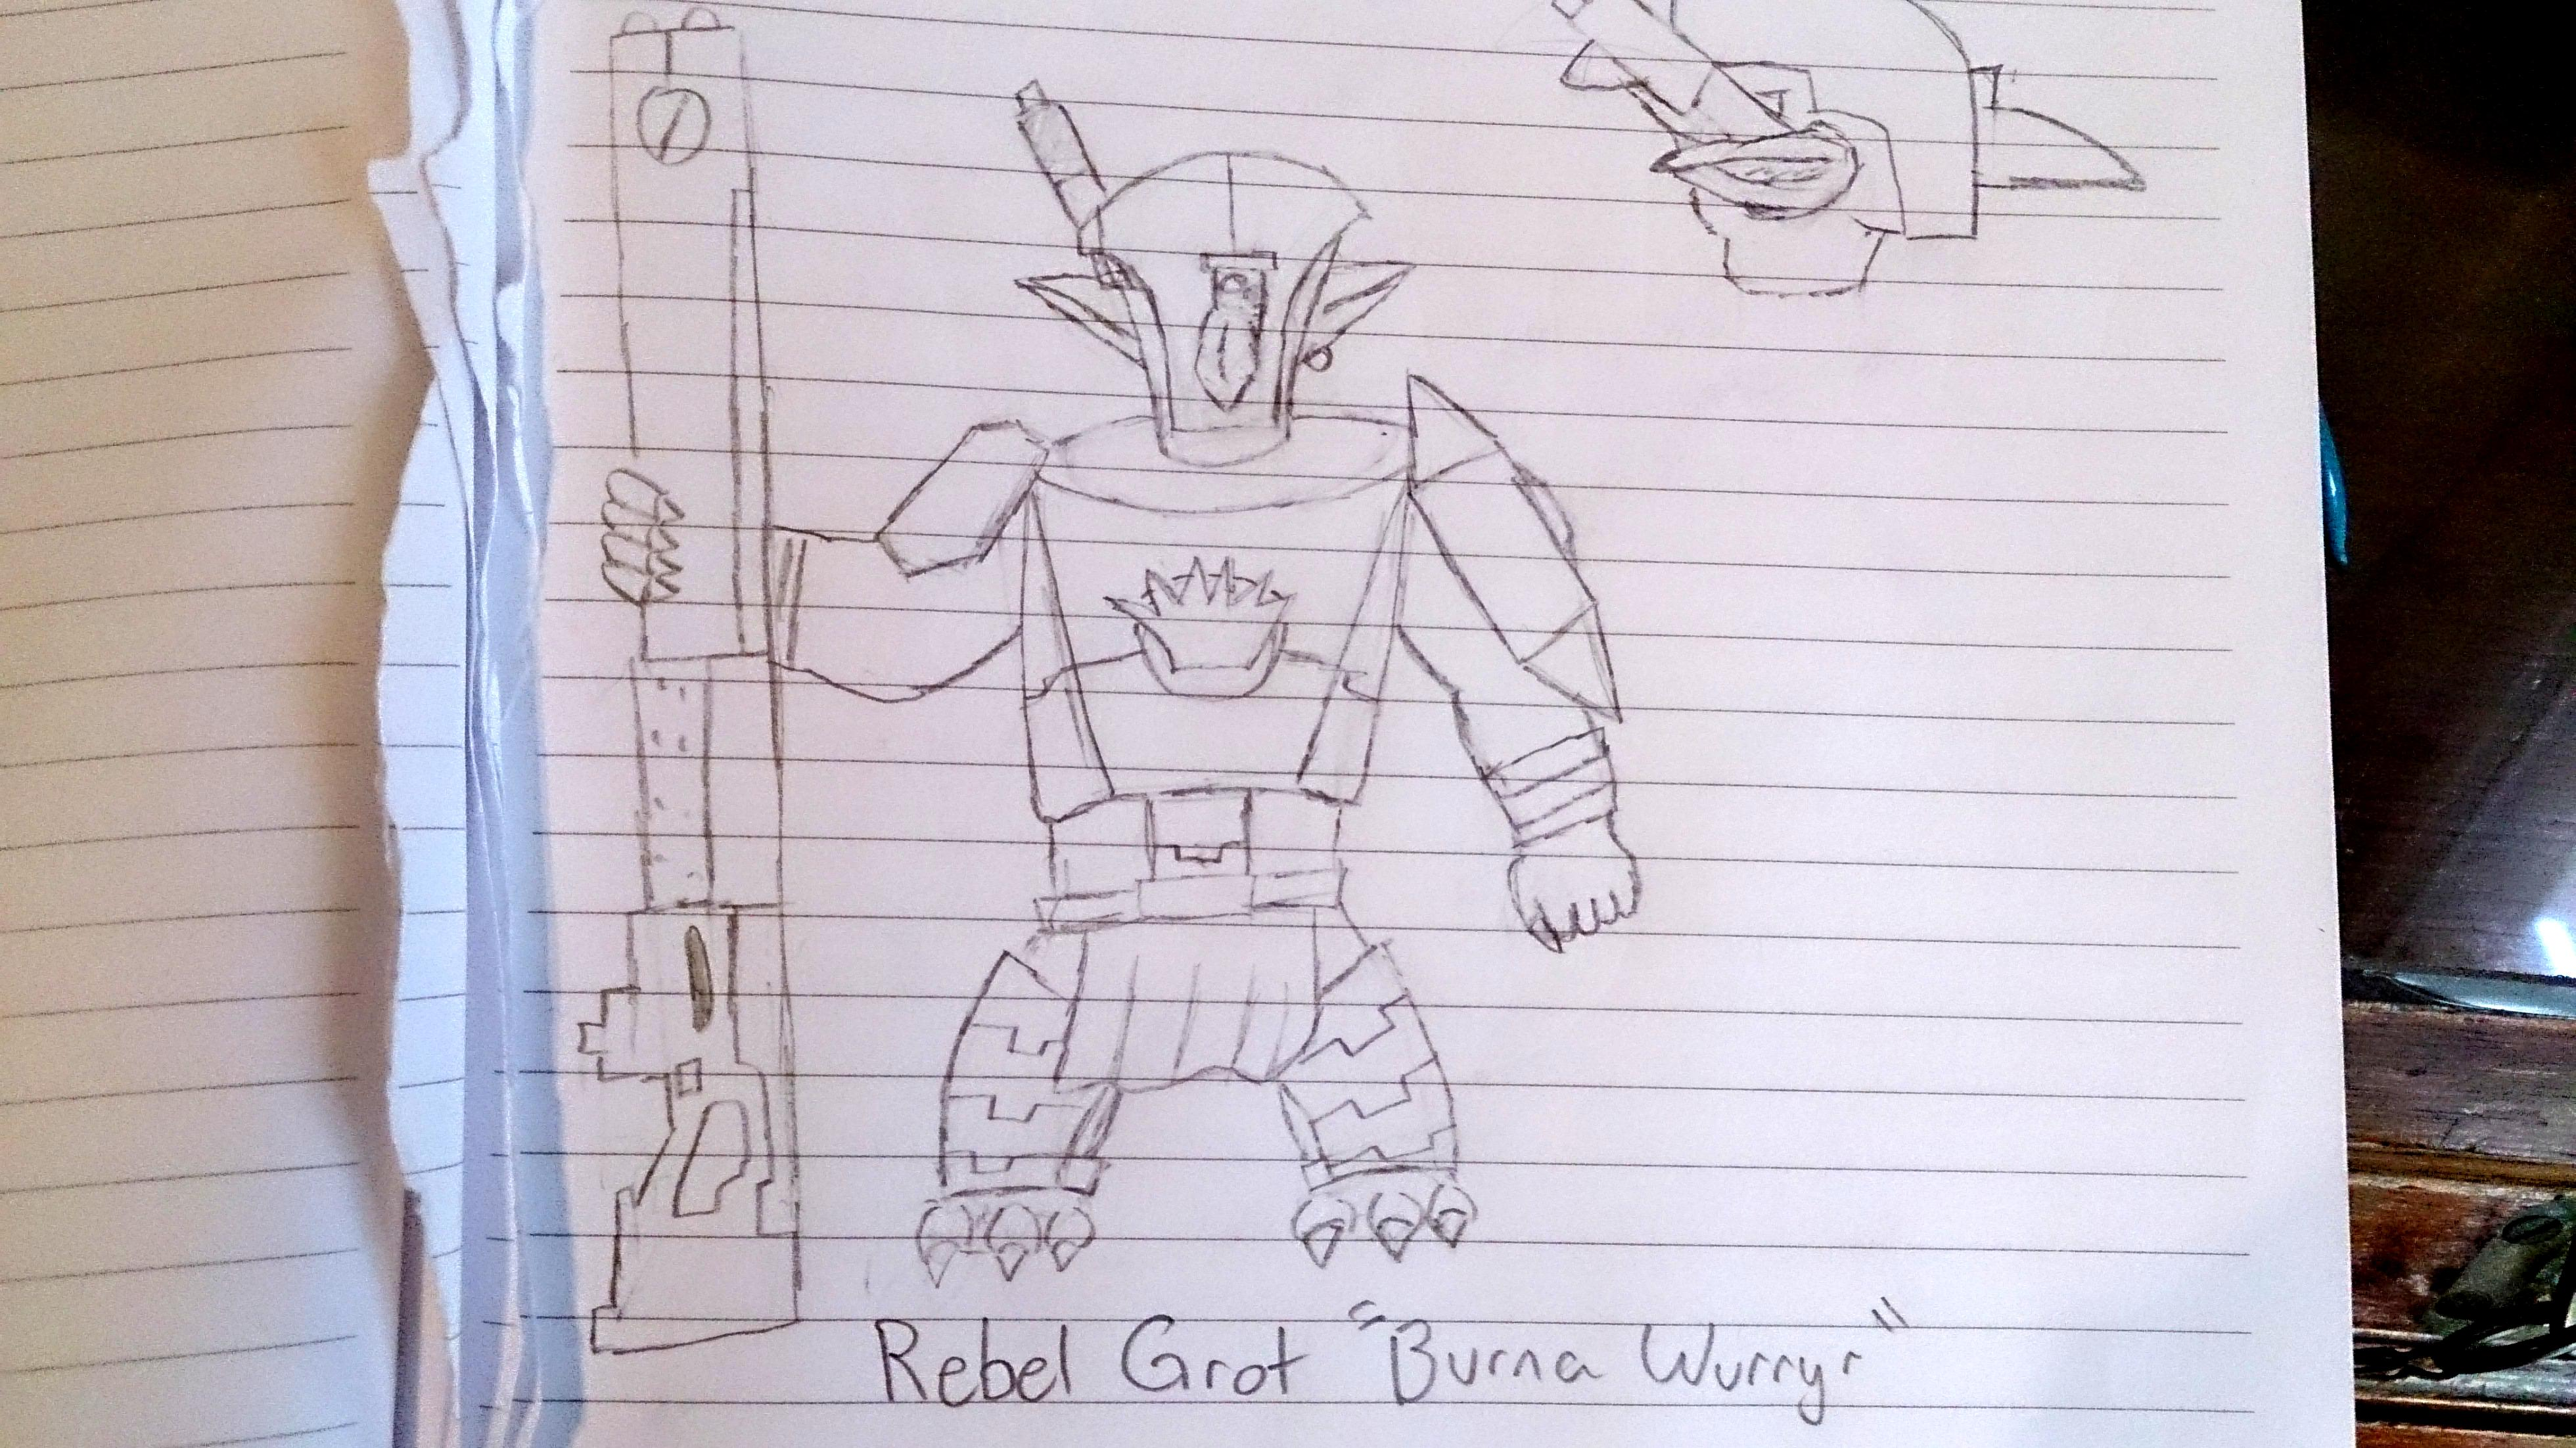 Conversion, Gretchin, Rebel Grots, Sketch